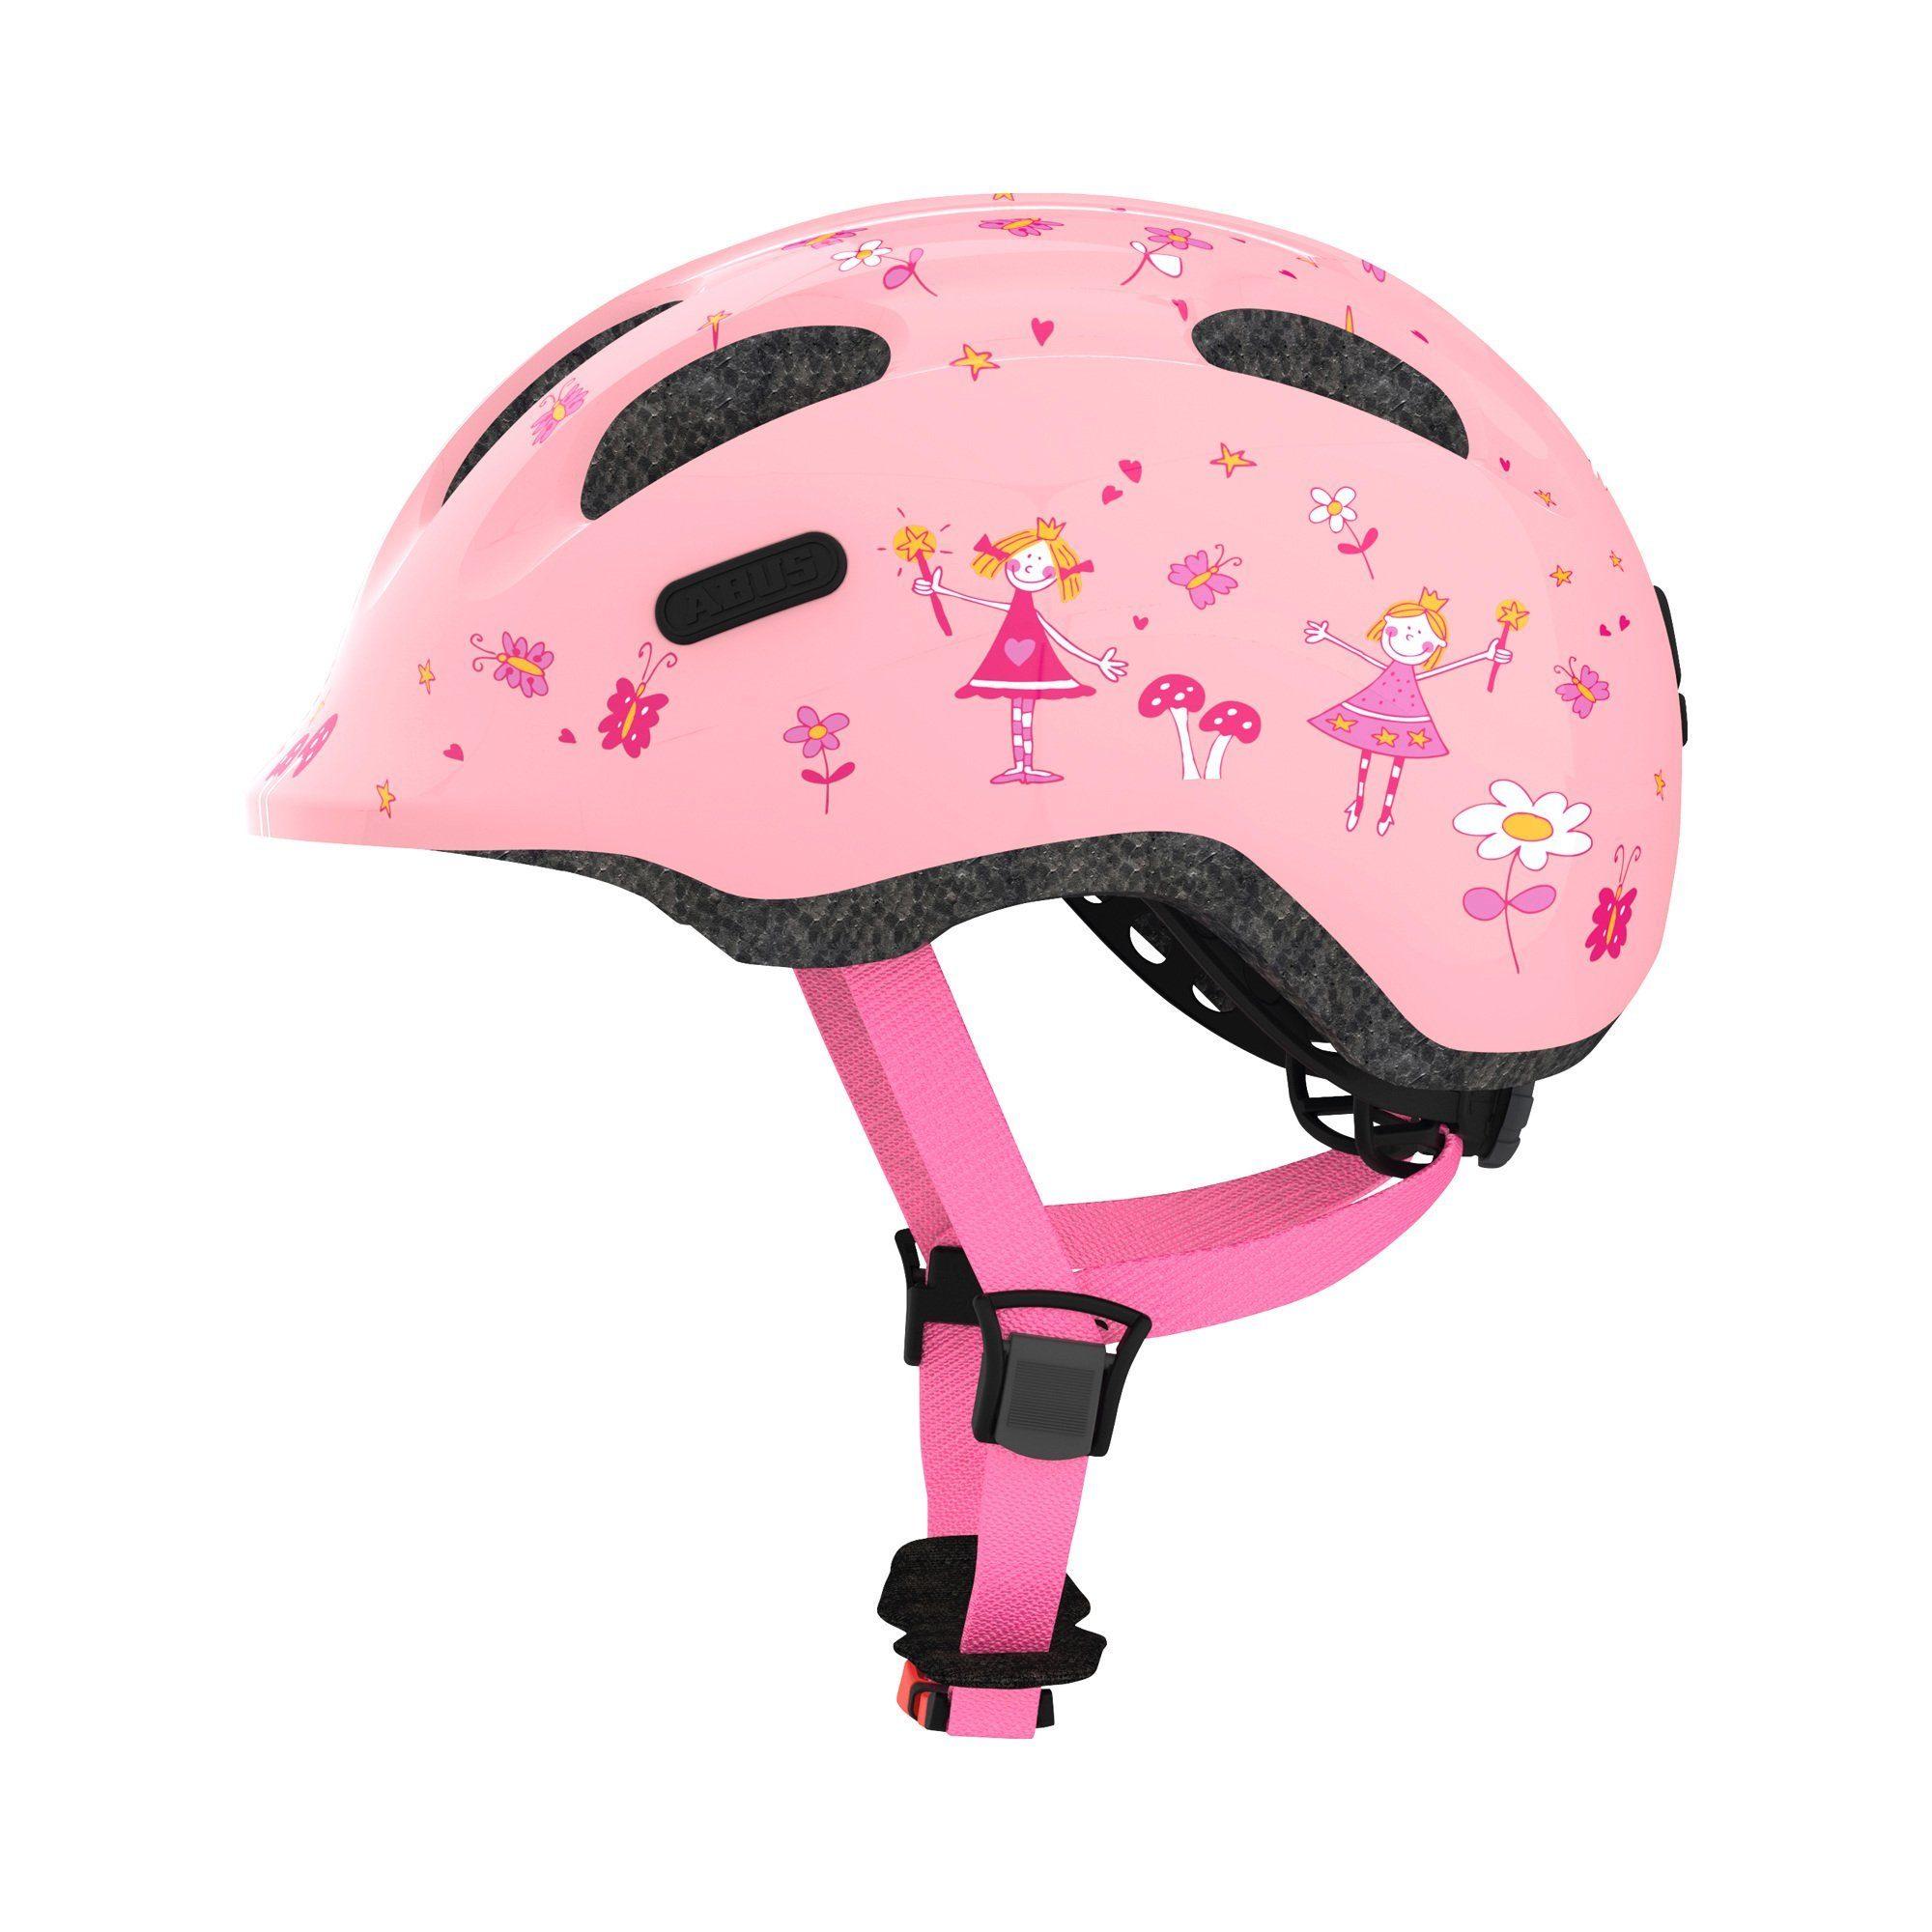 ABUS Fahrradhelm Smiley 2.0 rose Princess